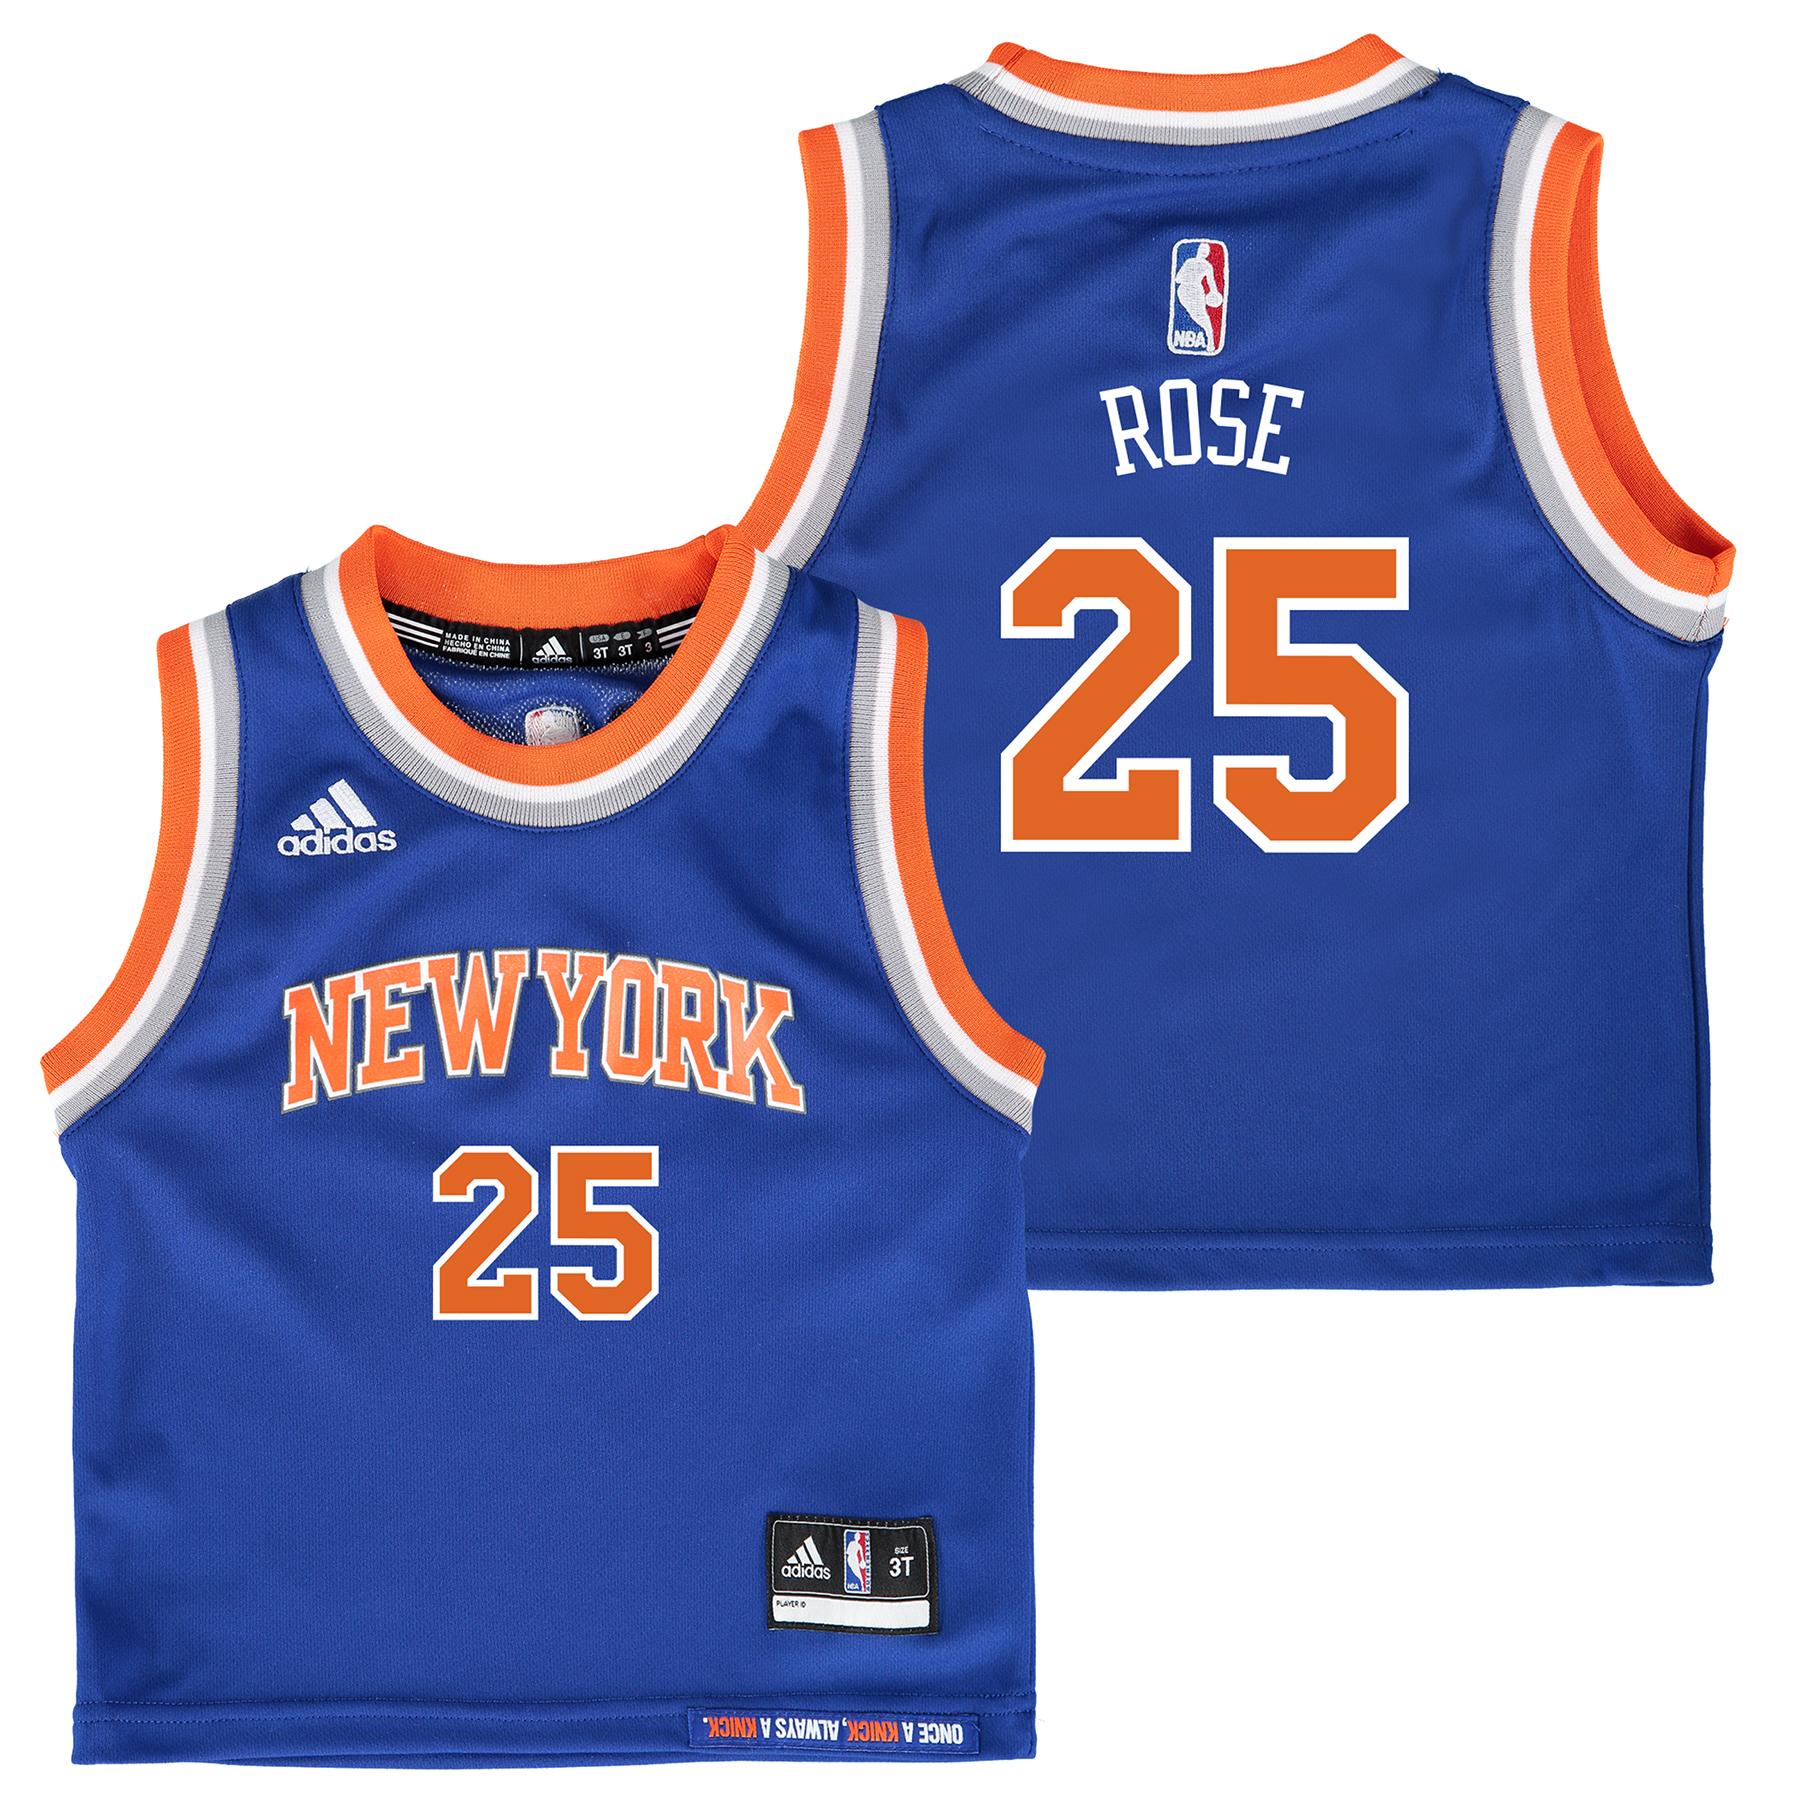 New York Knicks Road Replica Jersey - Derrick Rose - Toddler